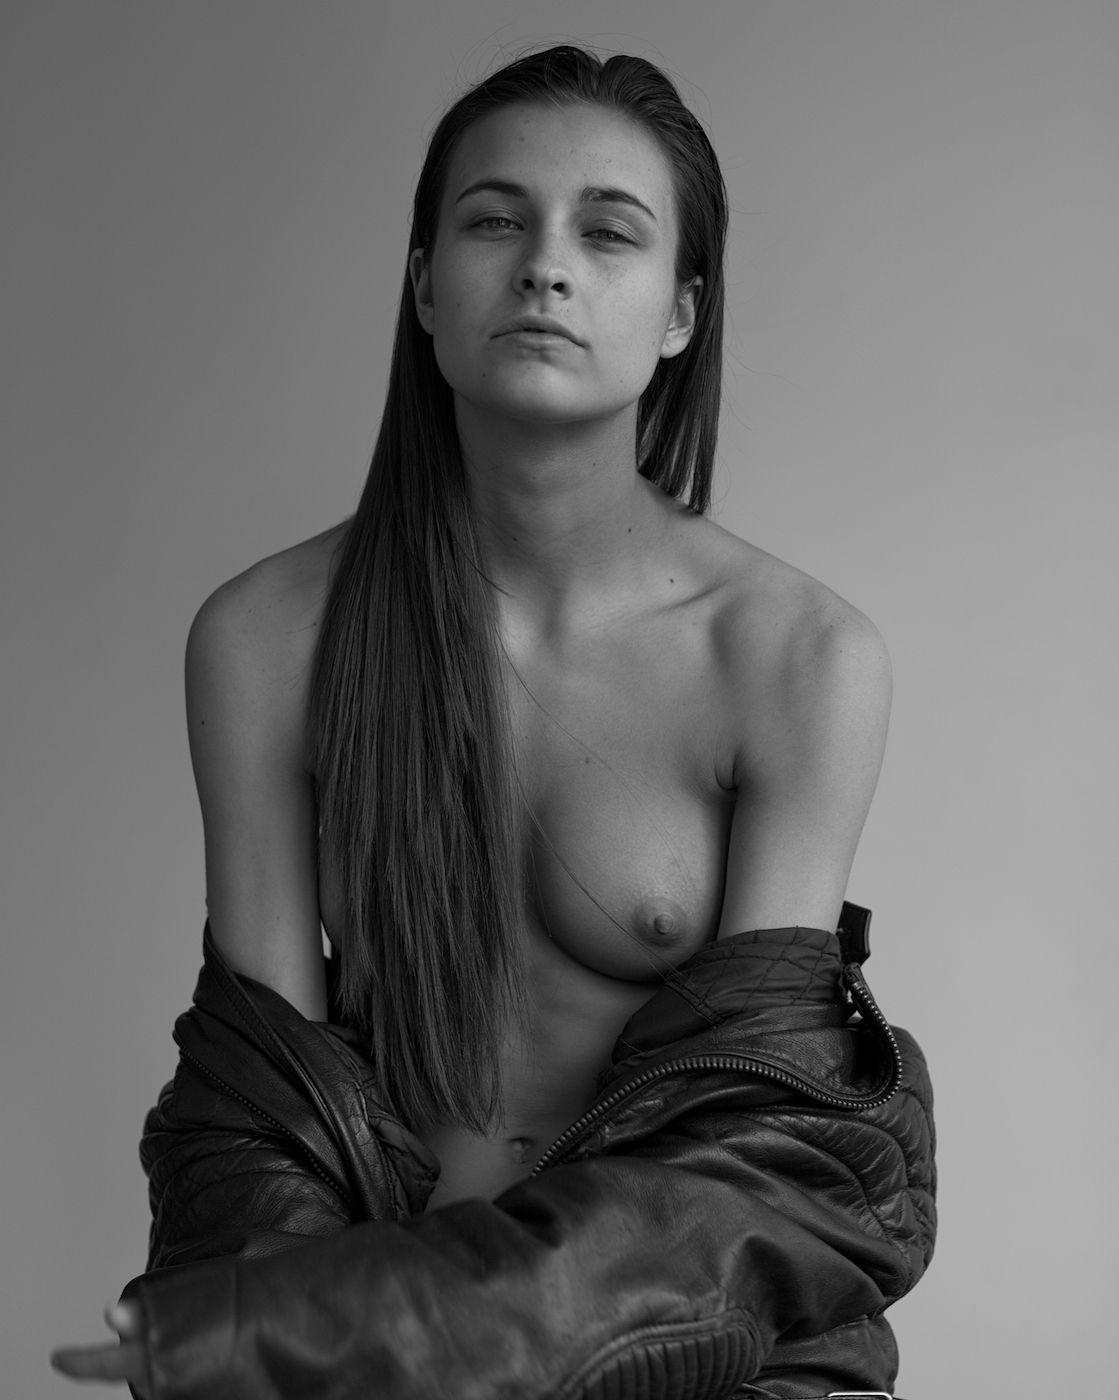 CelebGate Alyssia McGoogan Topless - 7 Photos nude (55 photo), Topless Celebrites images